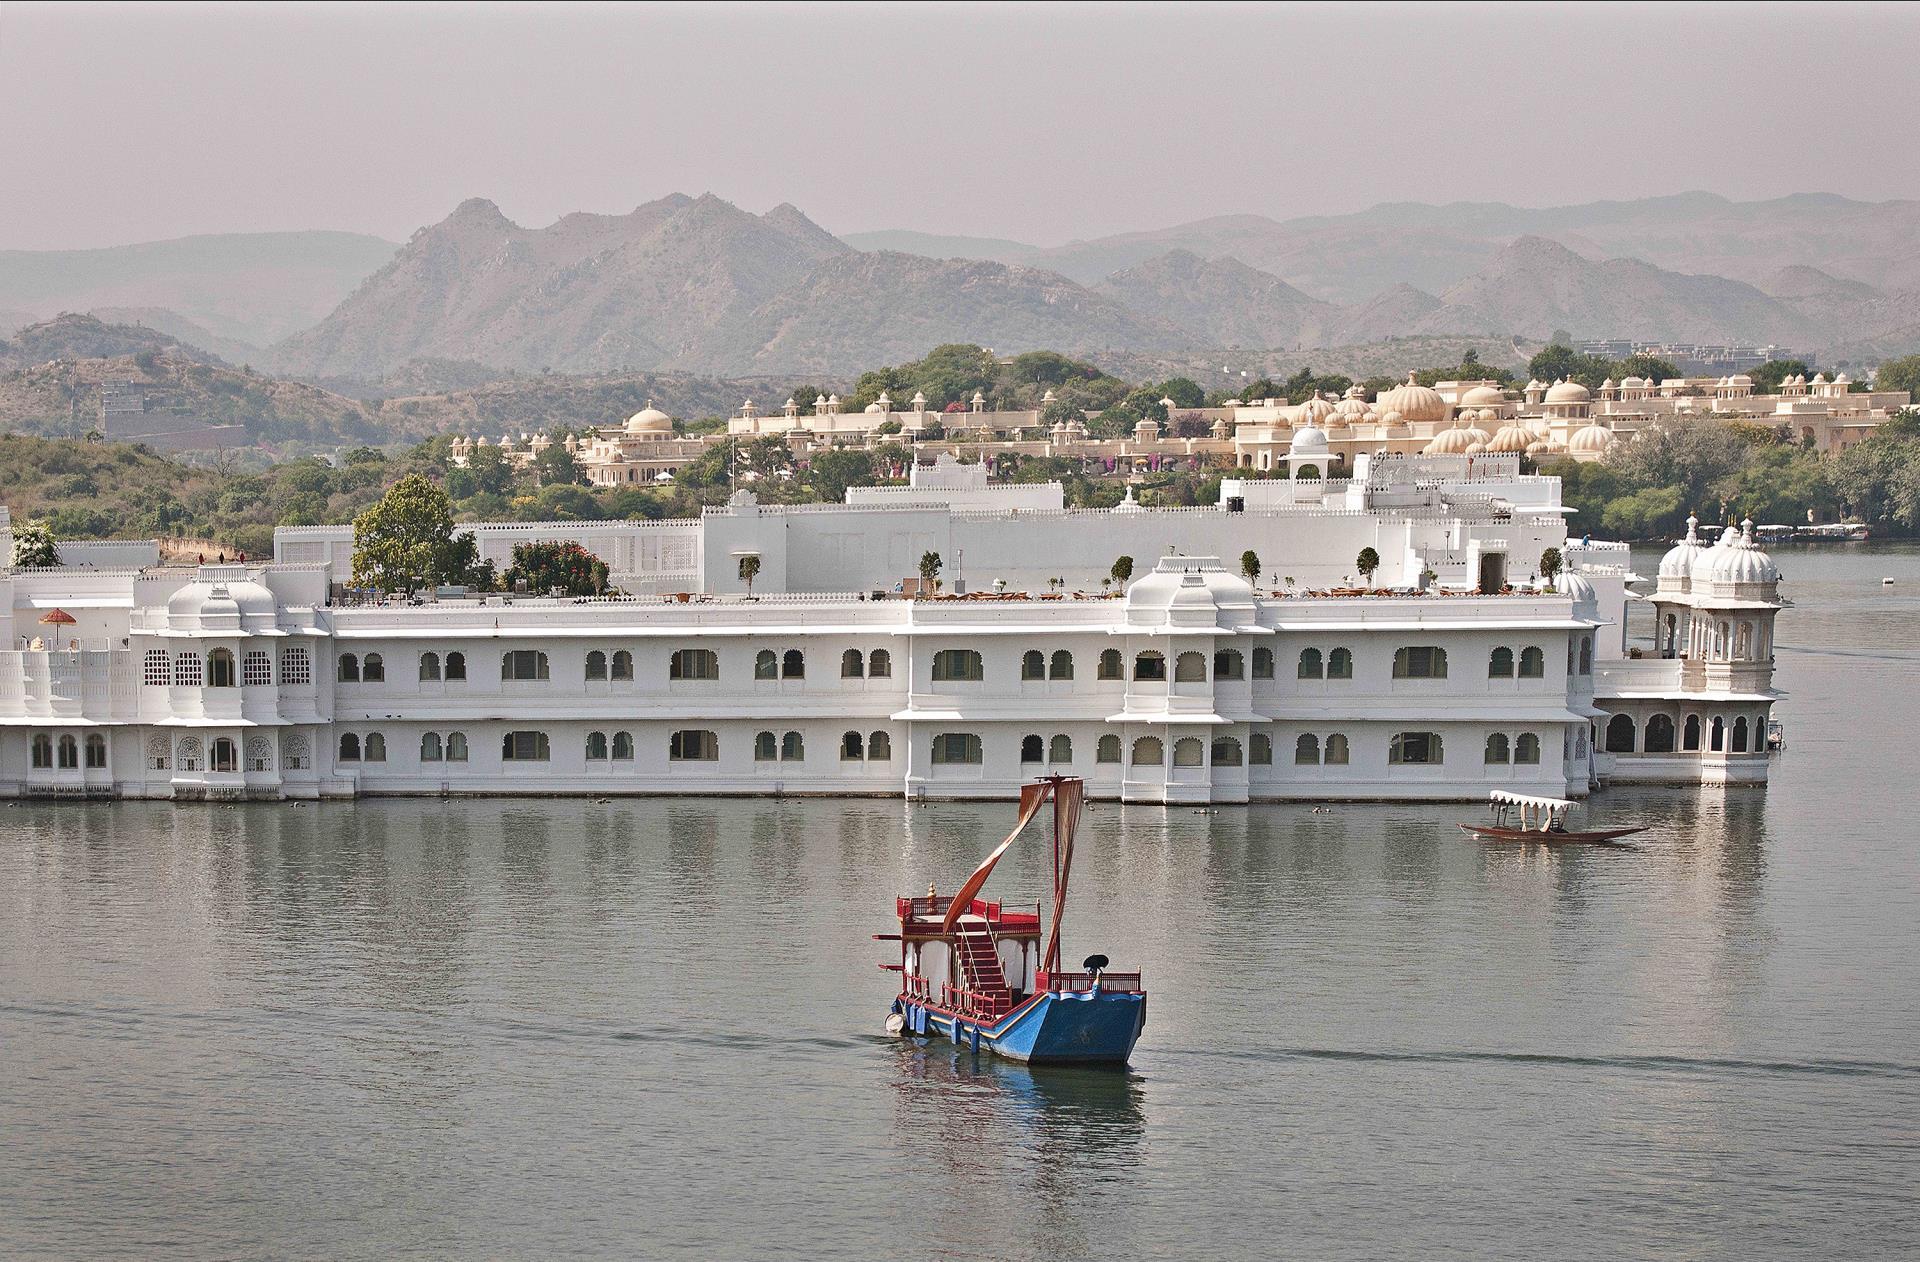 The Magical Rajasthan 8